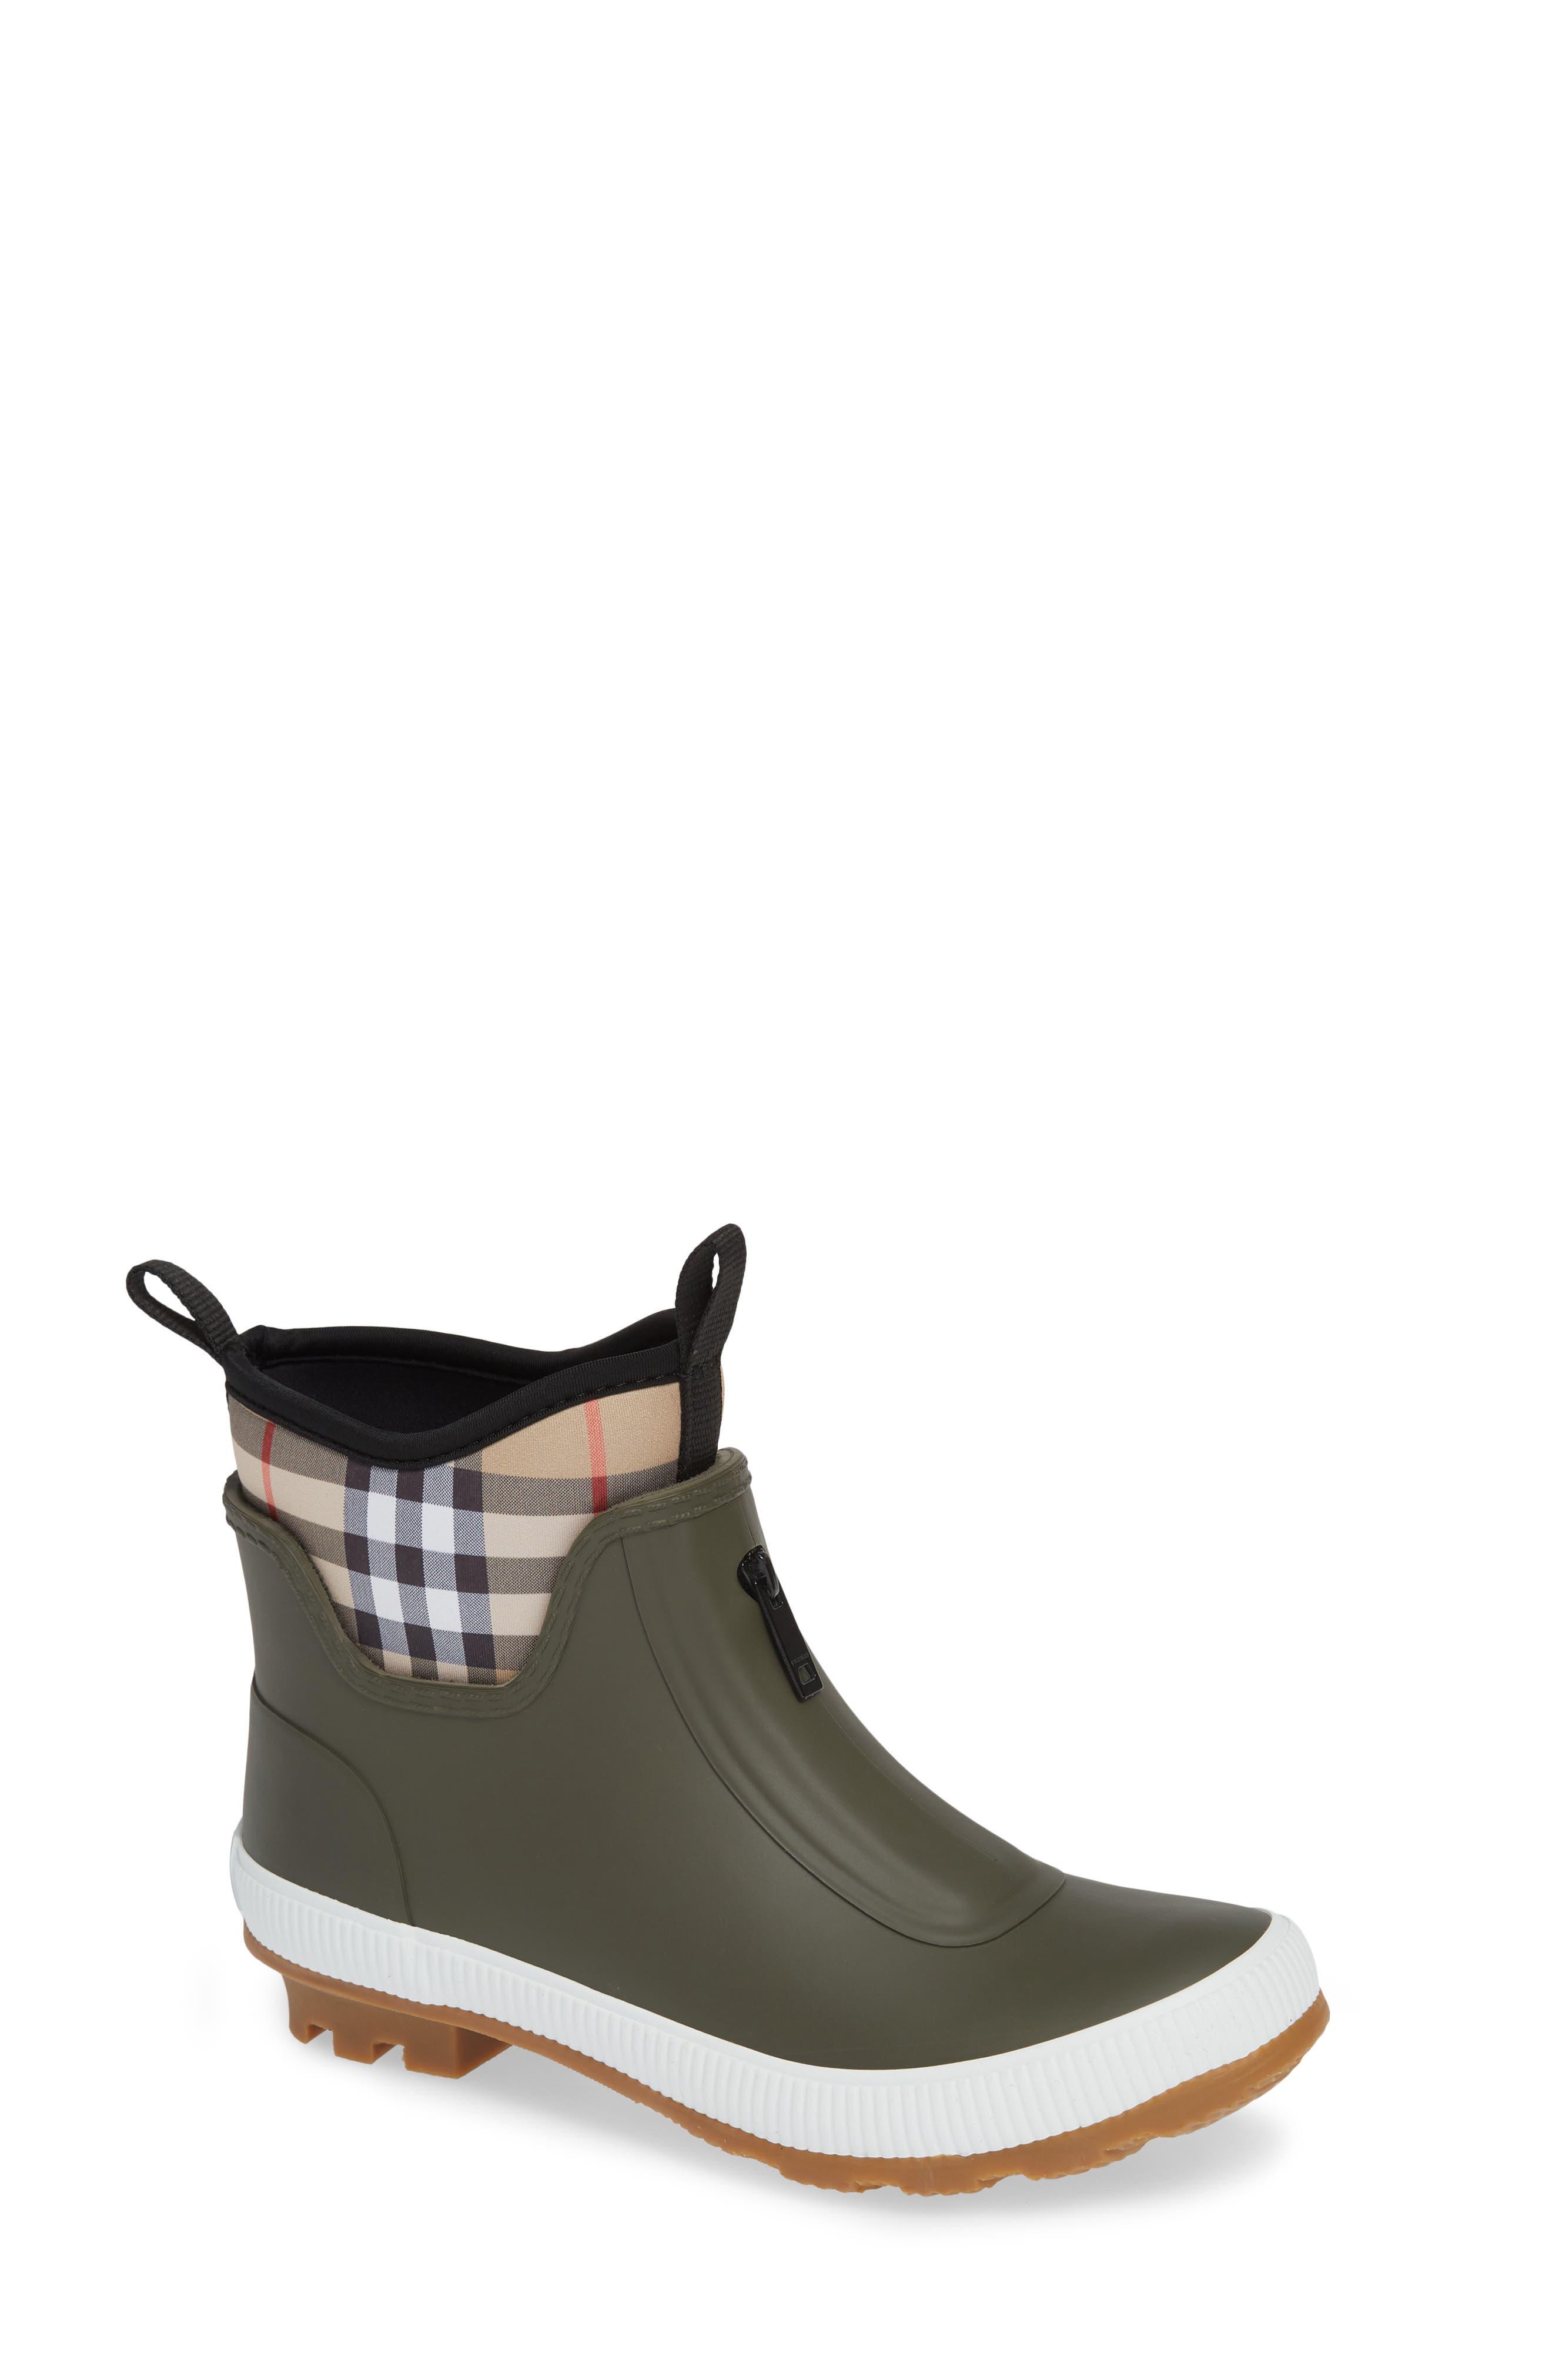 Flinton Rain Boot,                         Main,                         color, MILITARY GREEN